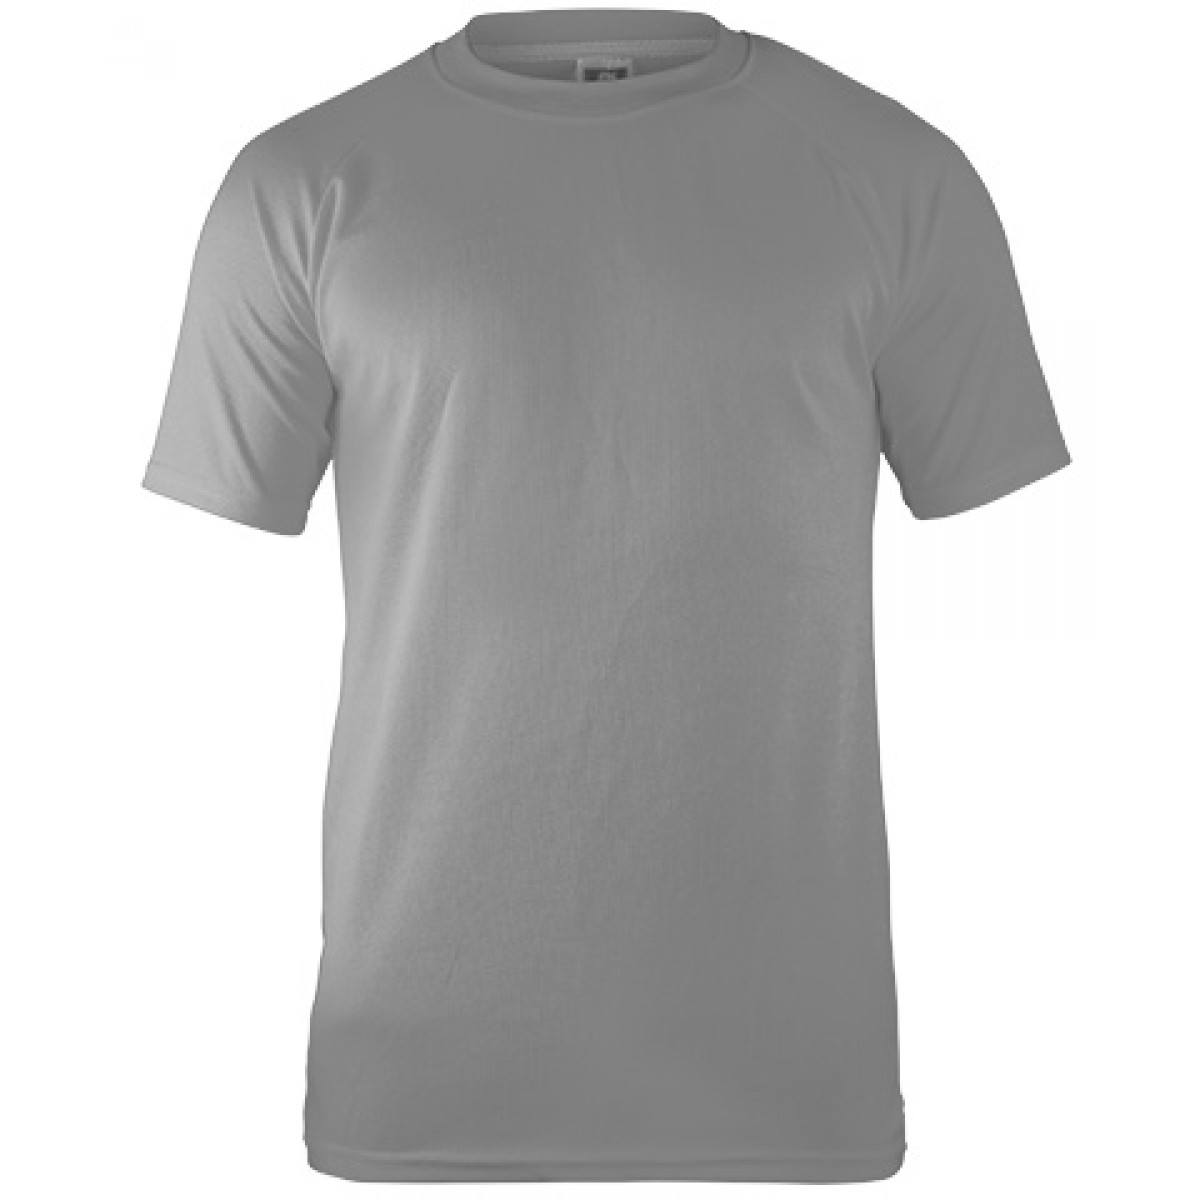 Performance T-shirt-Gray -2XL